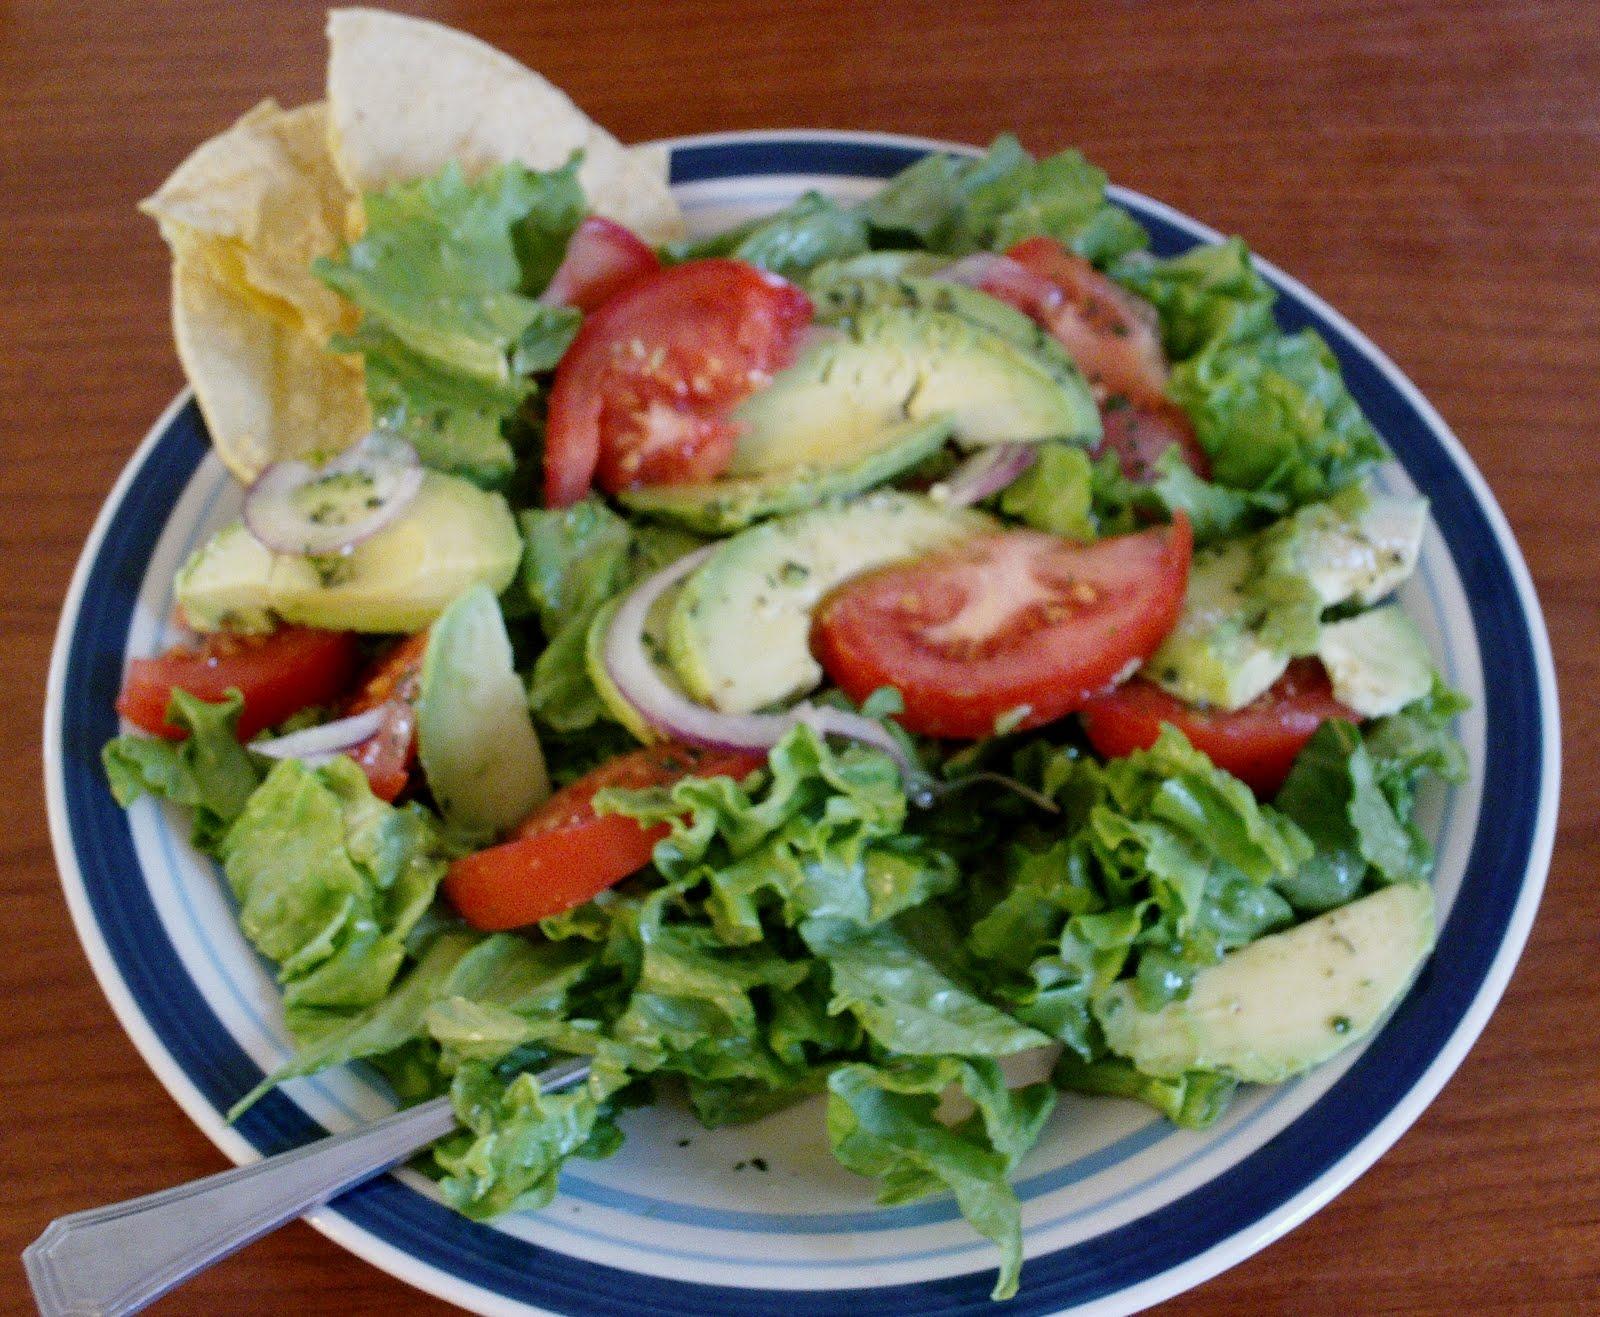 My Vegan Voyage and Vegan Recipes: My Favorite Avocado Salad